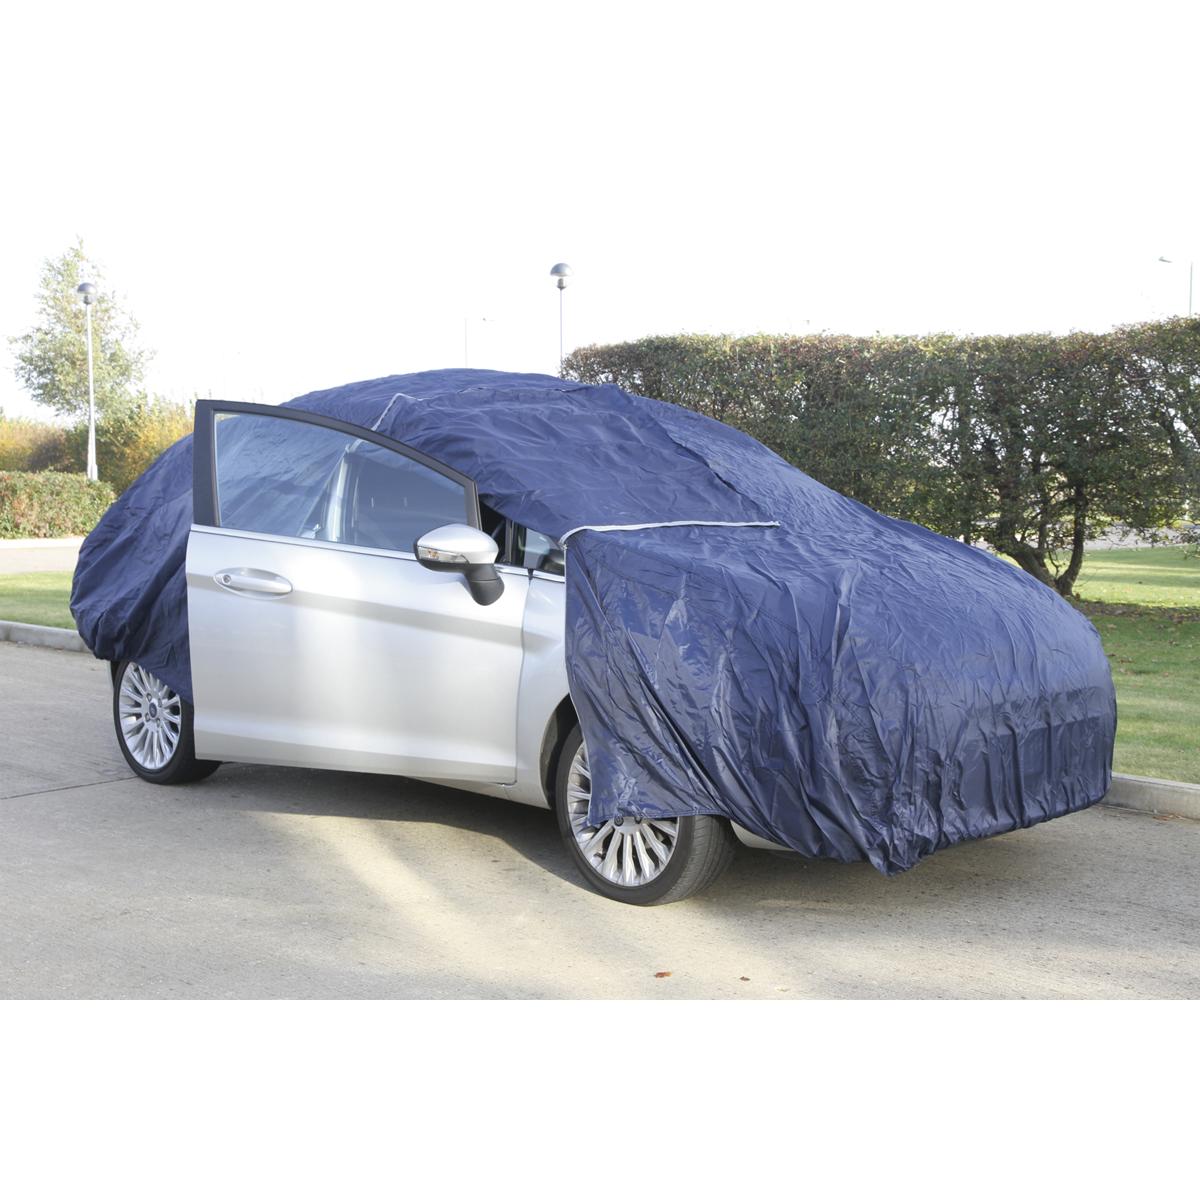 Car Cover Lightweight Medium 4060 x 1650 x 1220mm